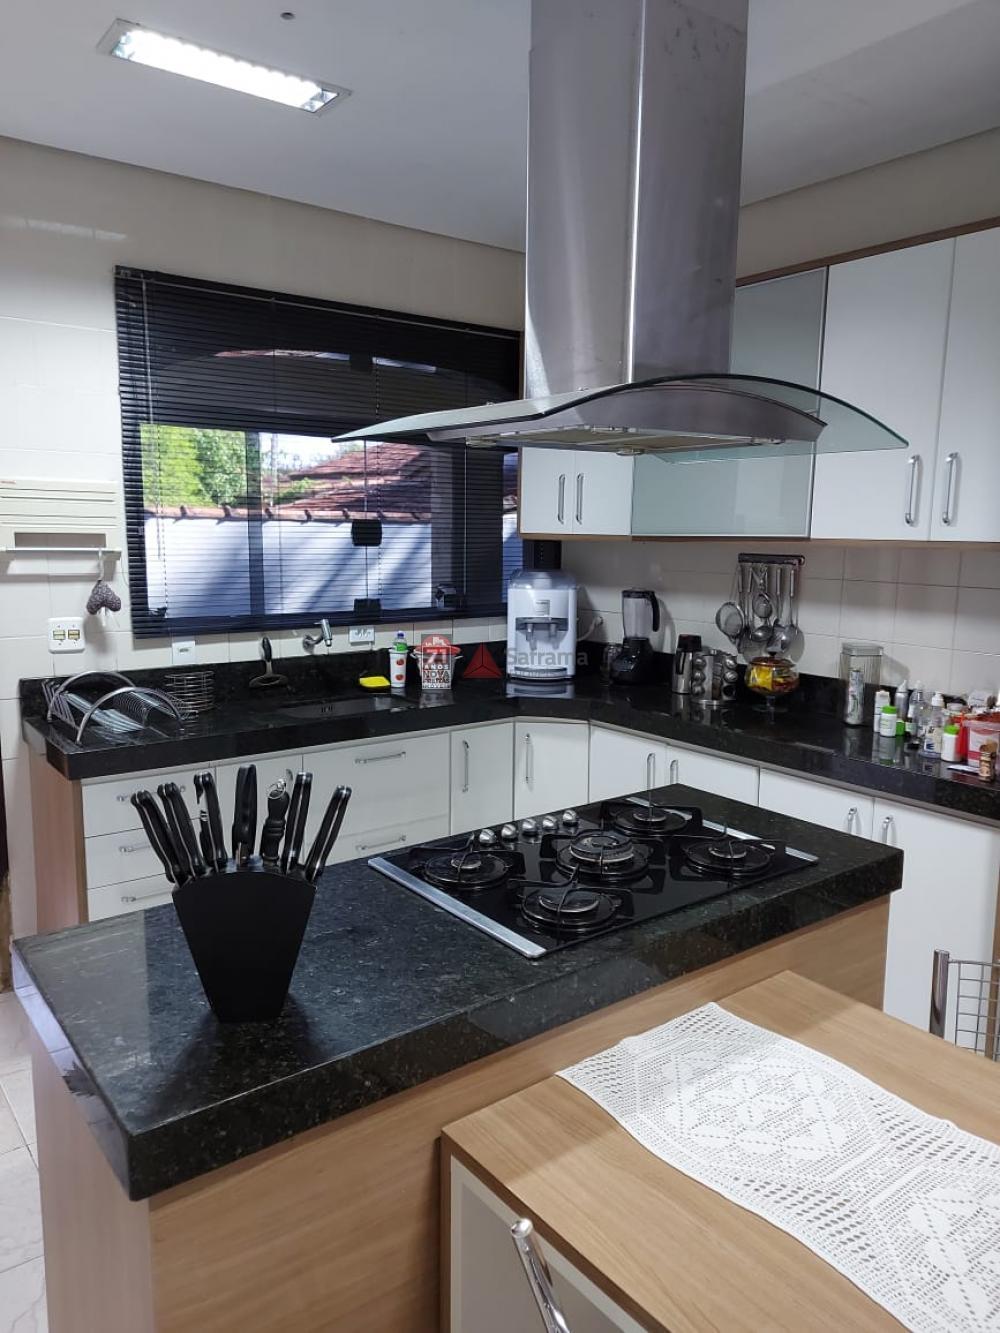 Comprar Casa / Padrão em Pindamonhangaba R$ 900.000,00 - Foto 6